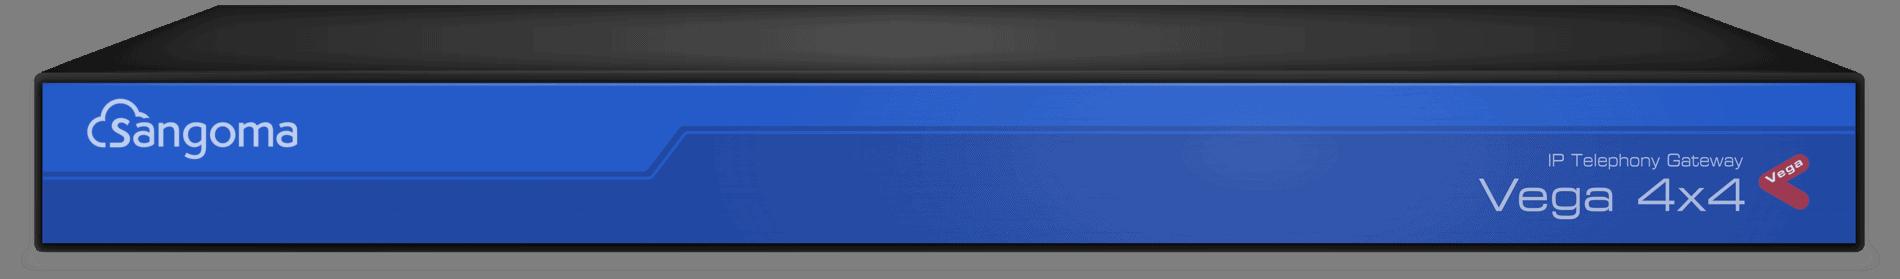 Sangoma Vega 4x4 Analog Gateway